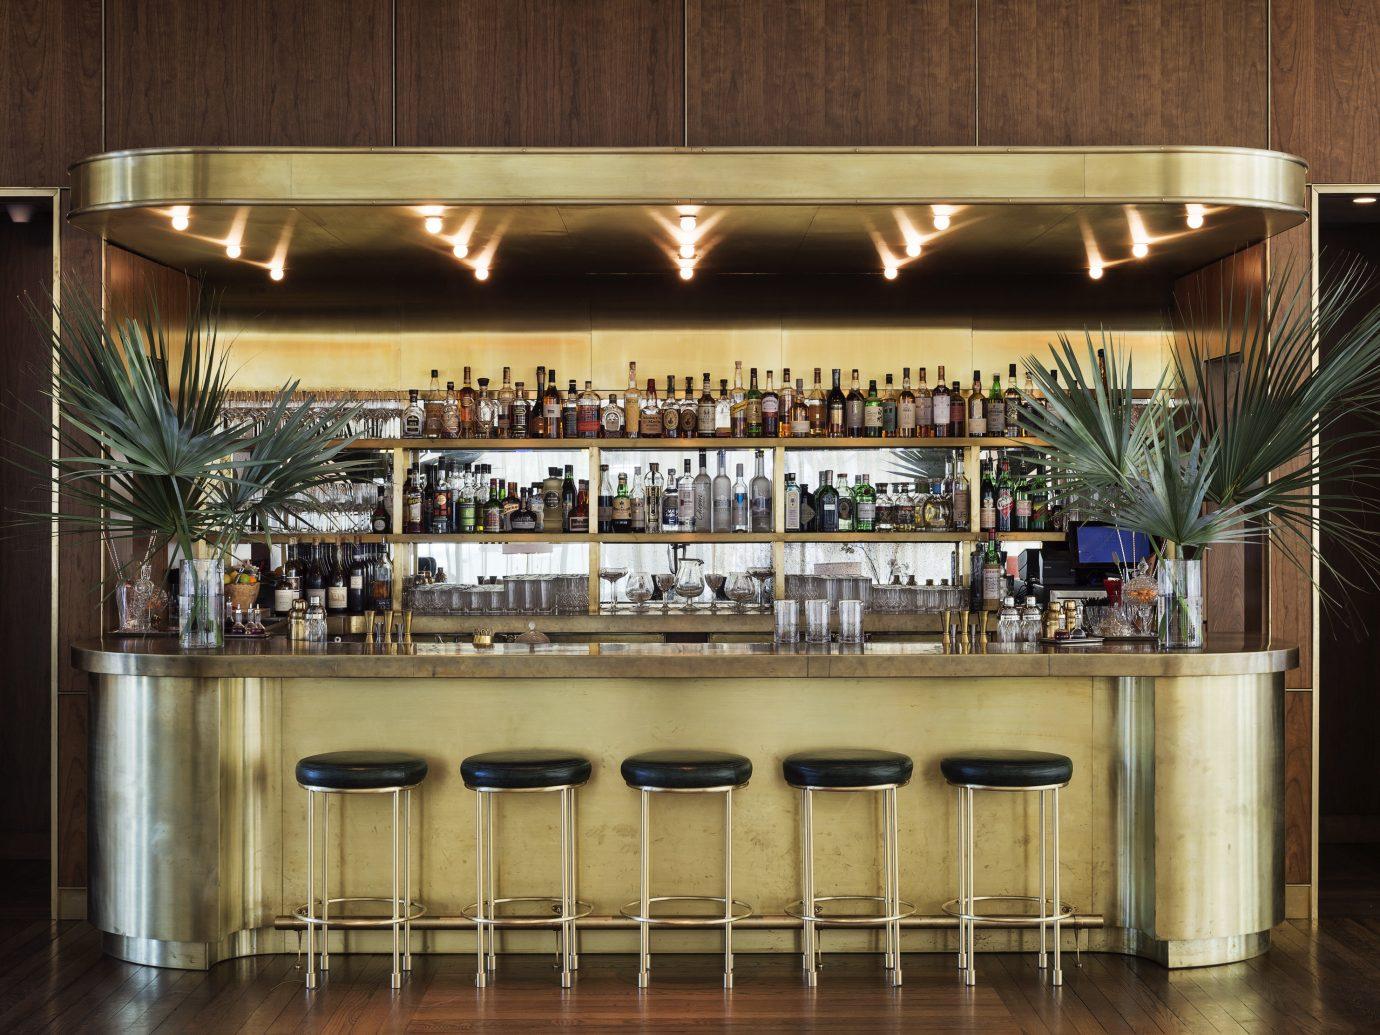 Hotels indoor floor Kitchen Bar restaurant interior design several